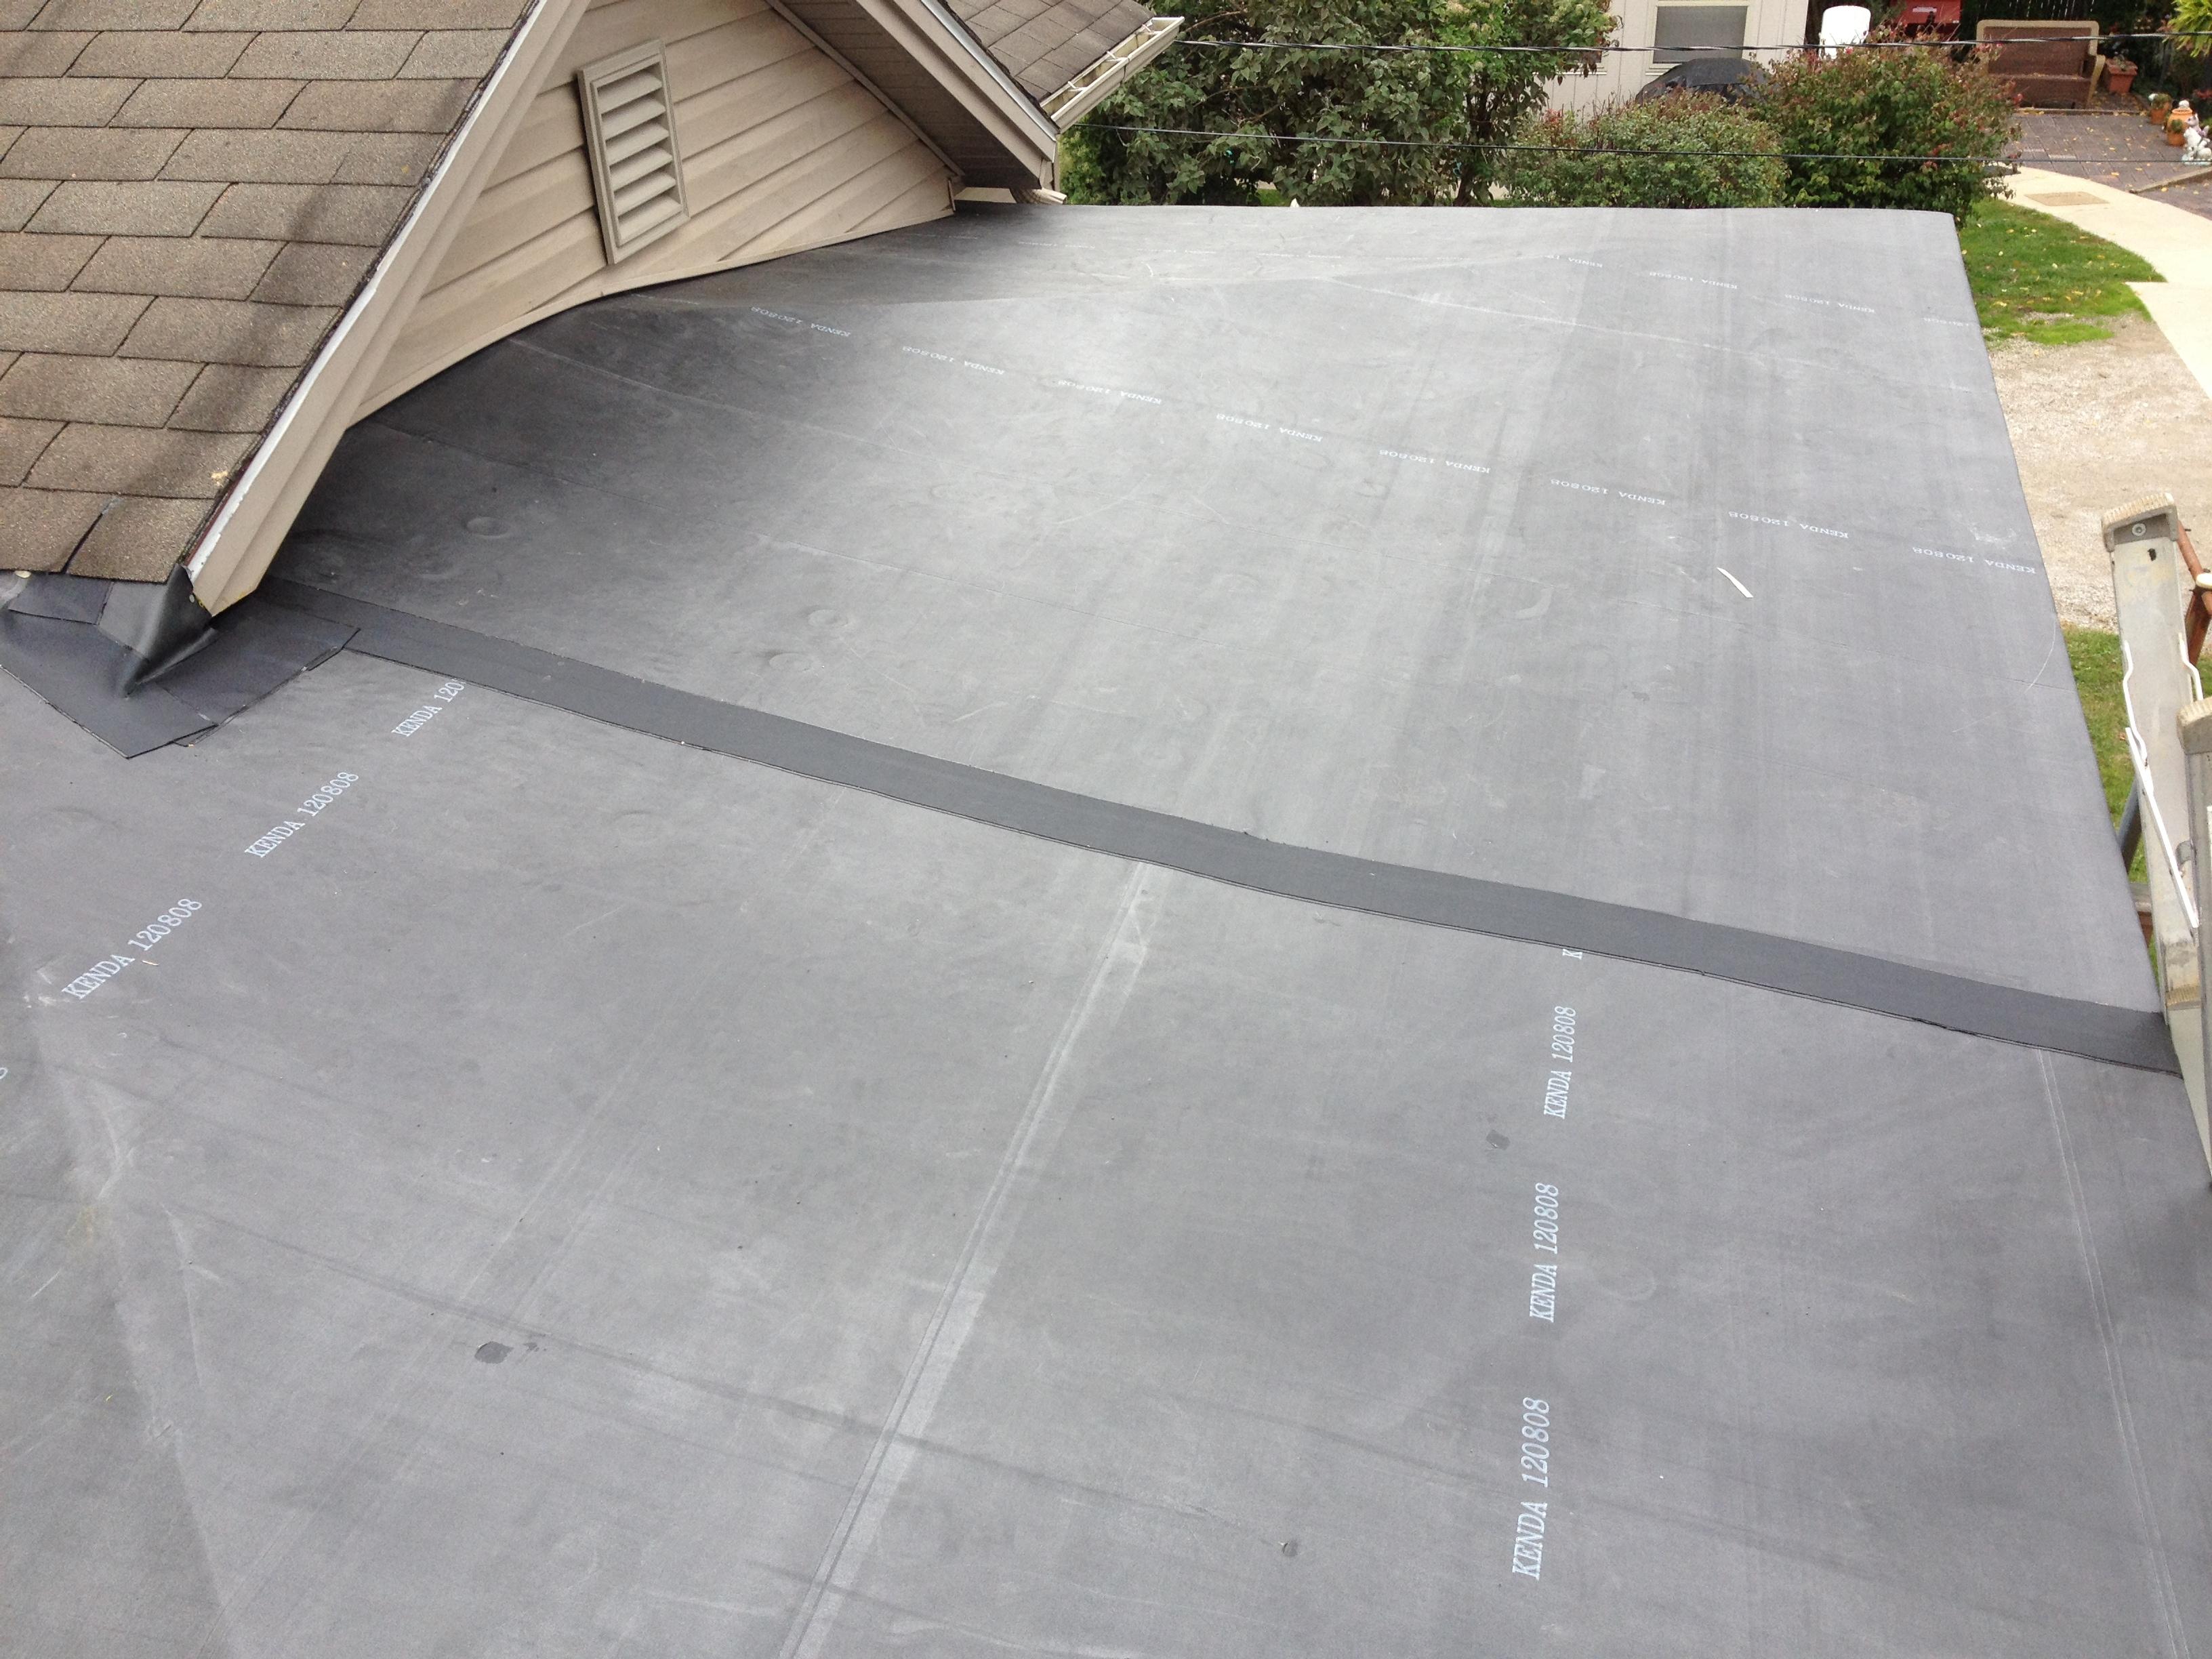 Rubber Roof Installation Hicksville Ohio Jeremykrill Com